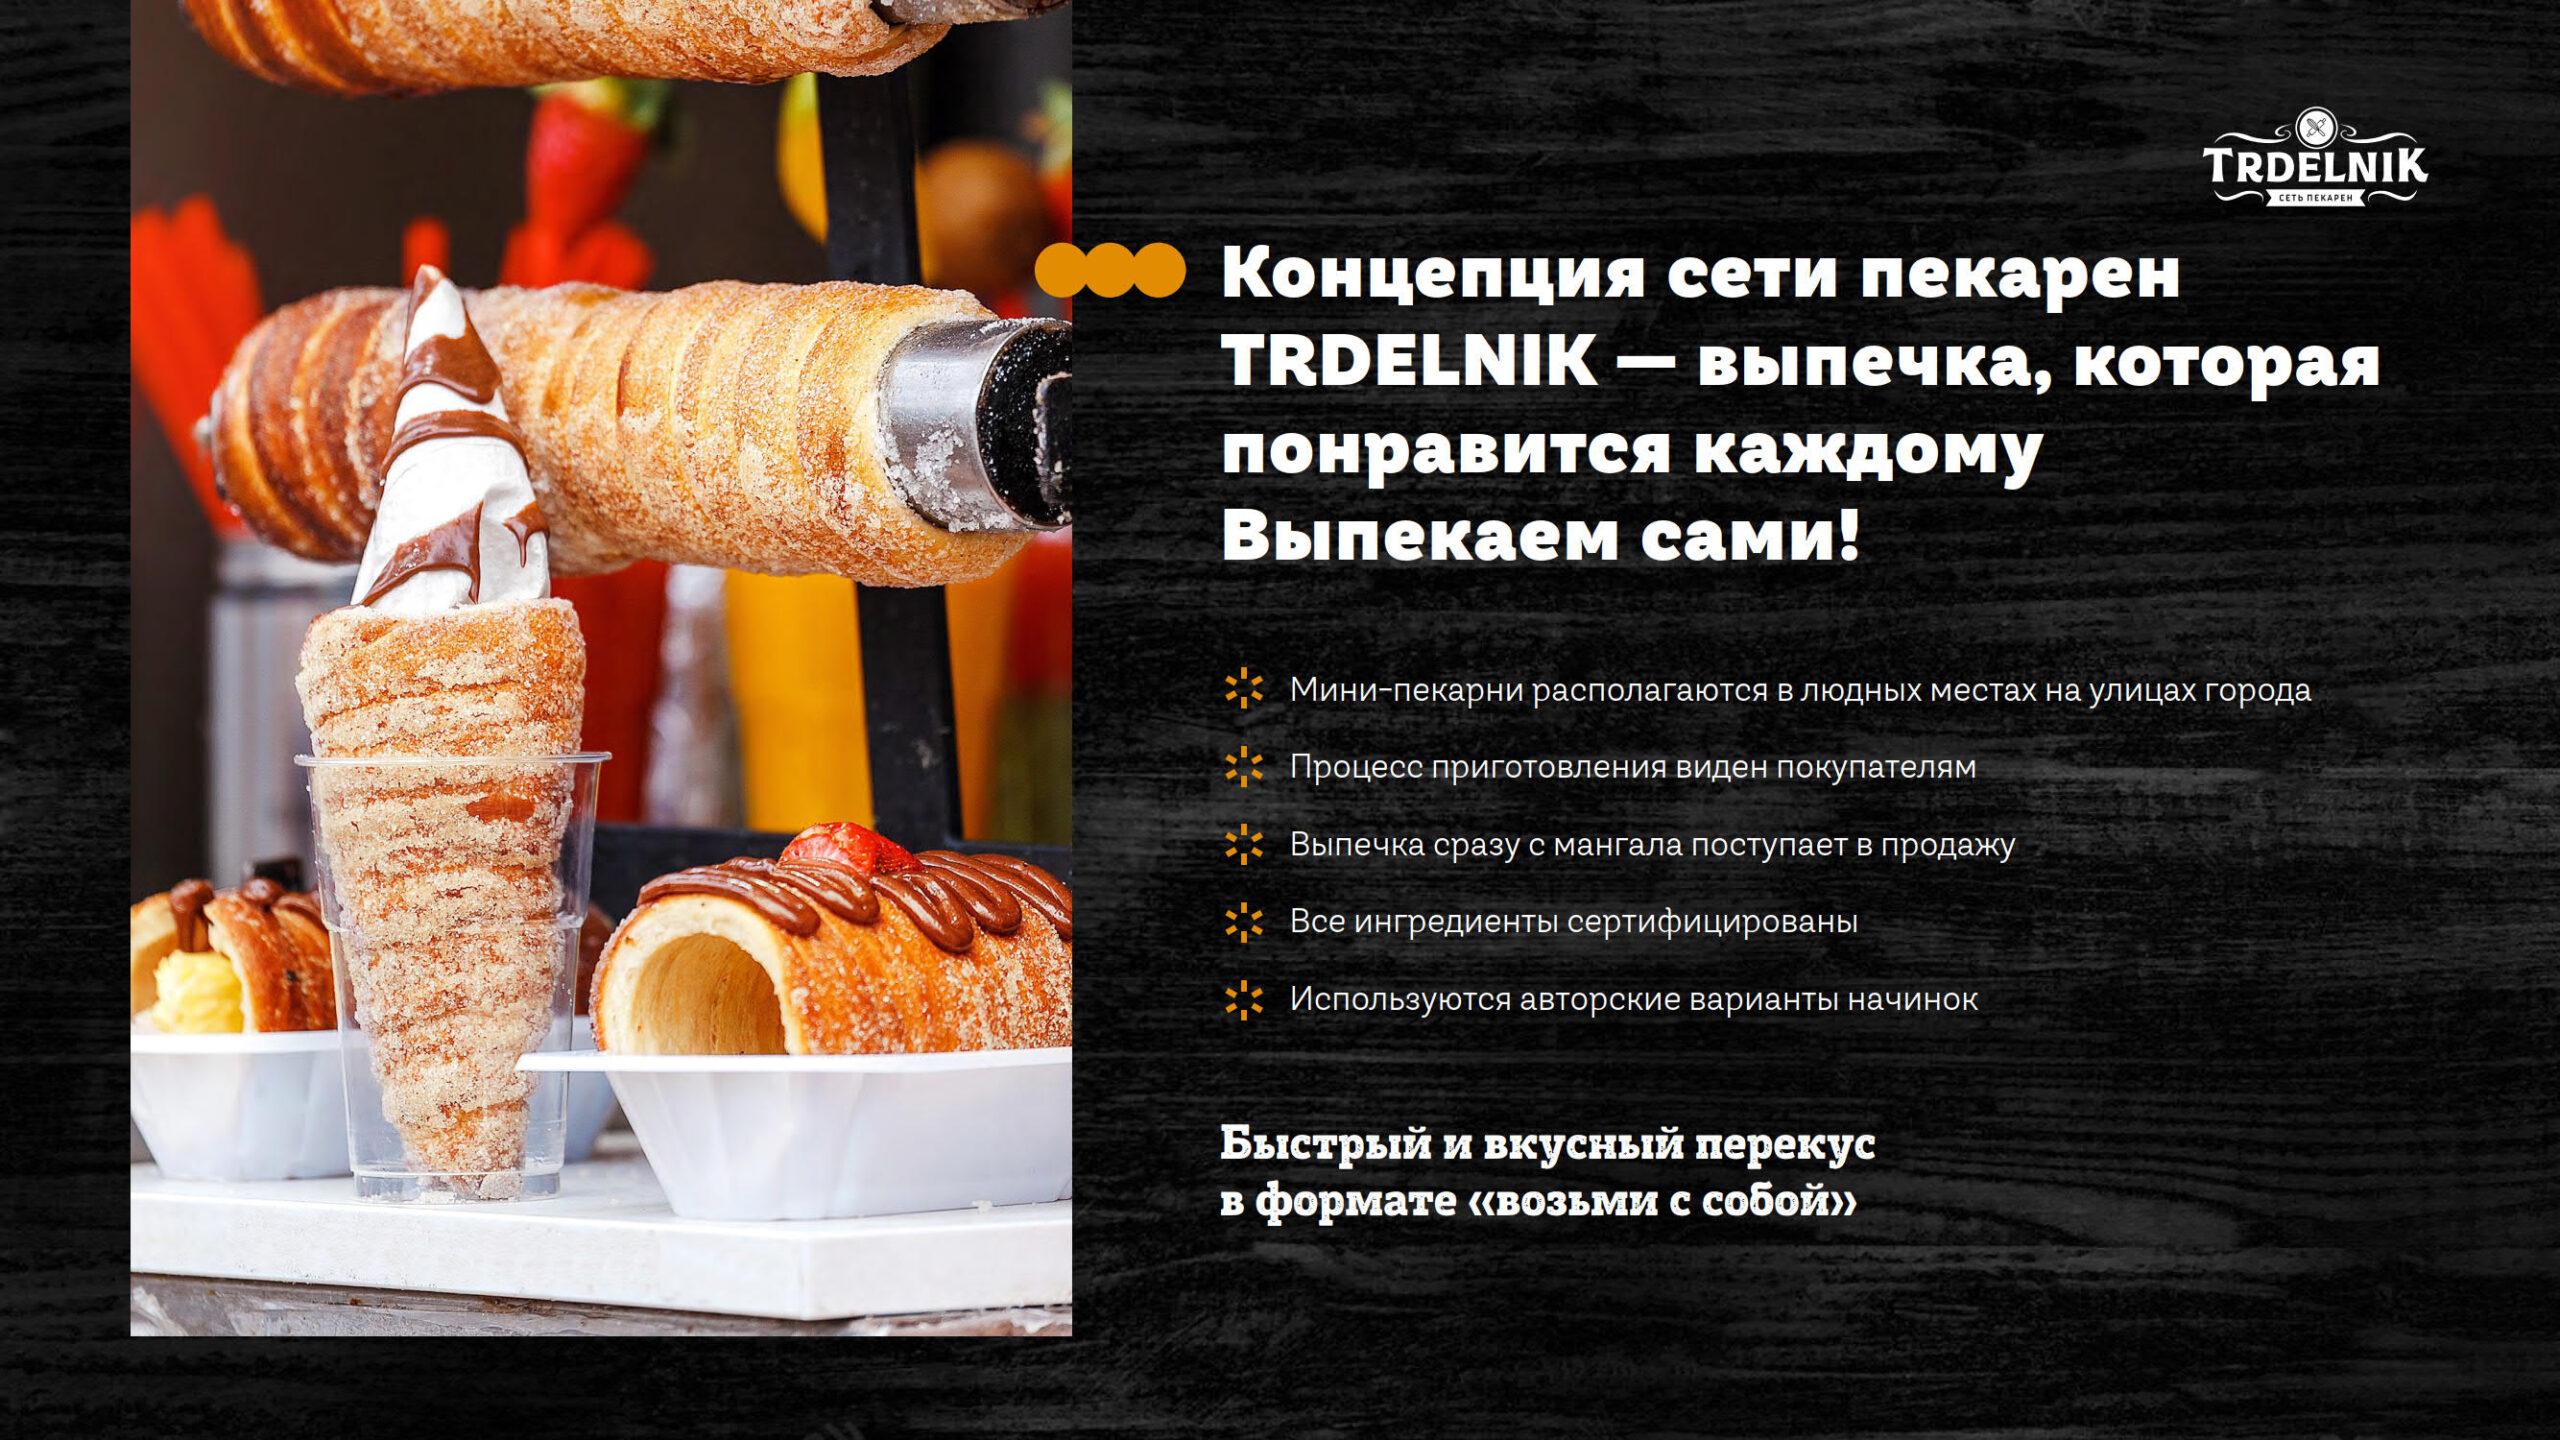 Презентация сети мини-пекарен Trdelnik для аренды места в ТРЦ